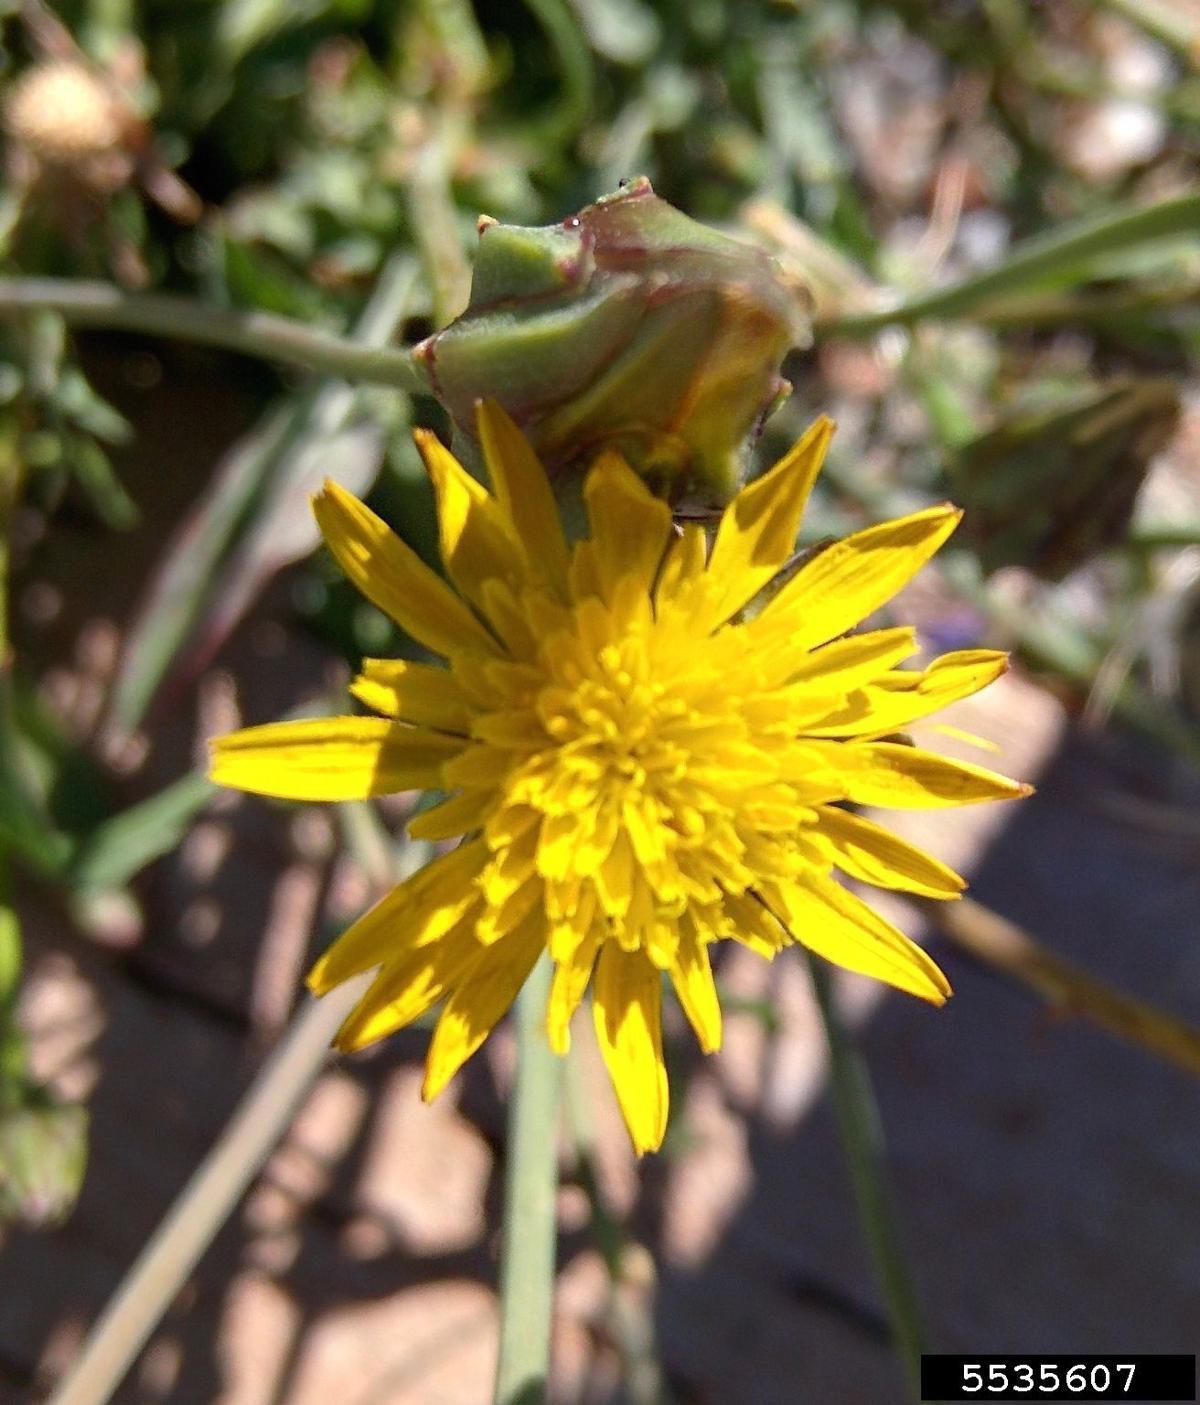 cutleaf vipergrass flower